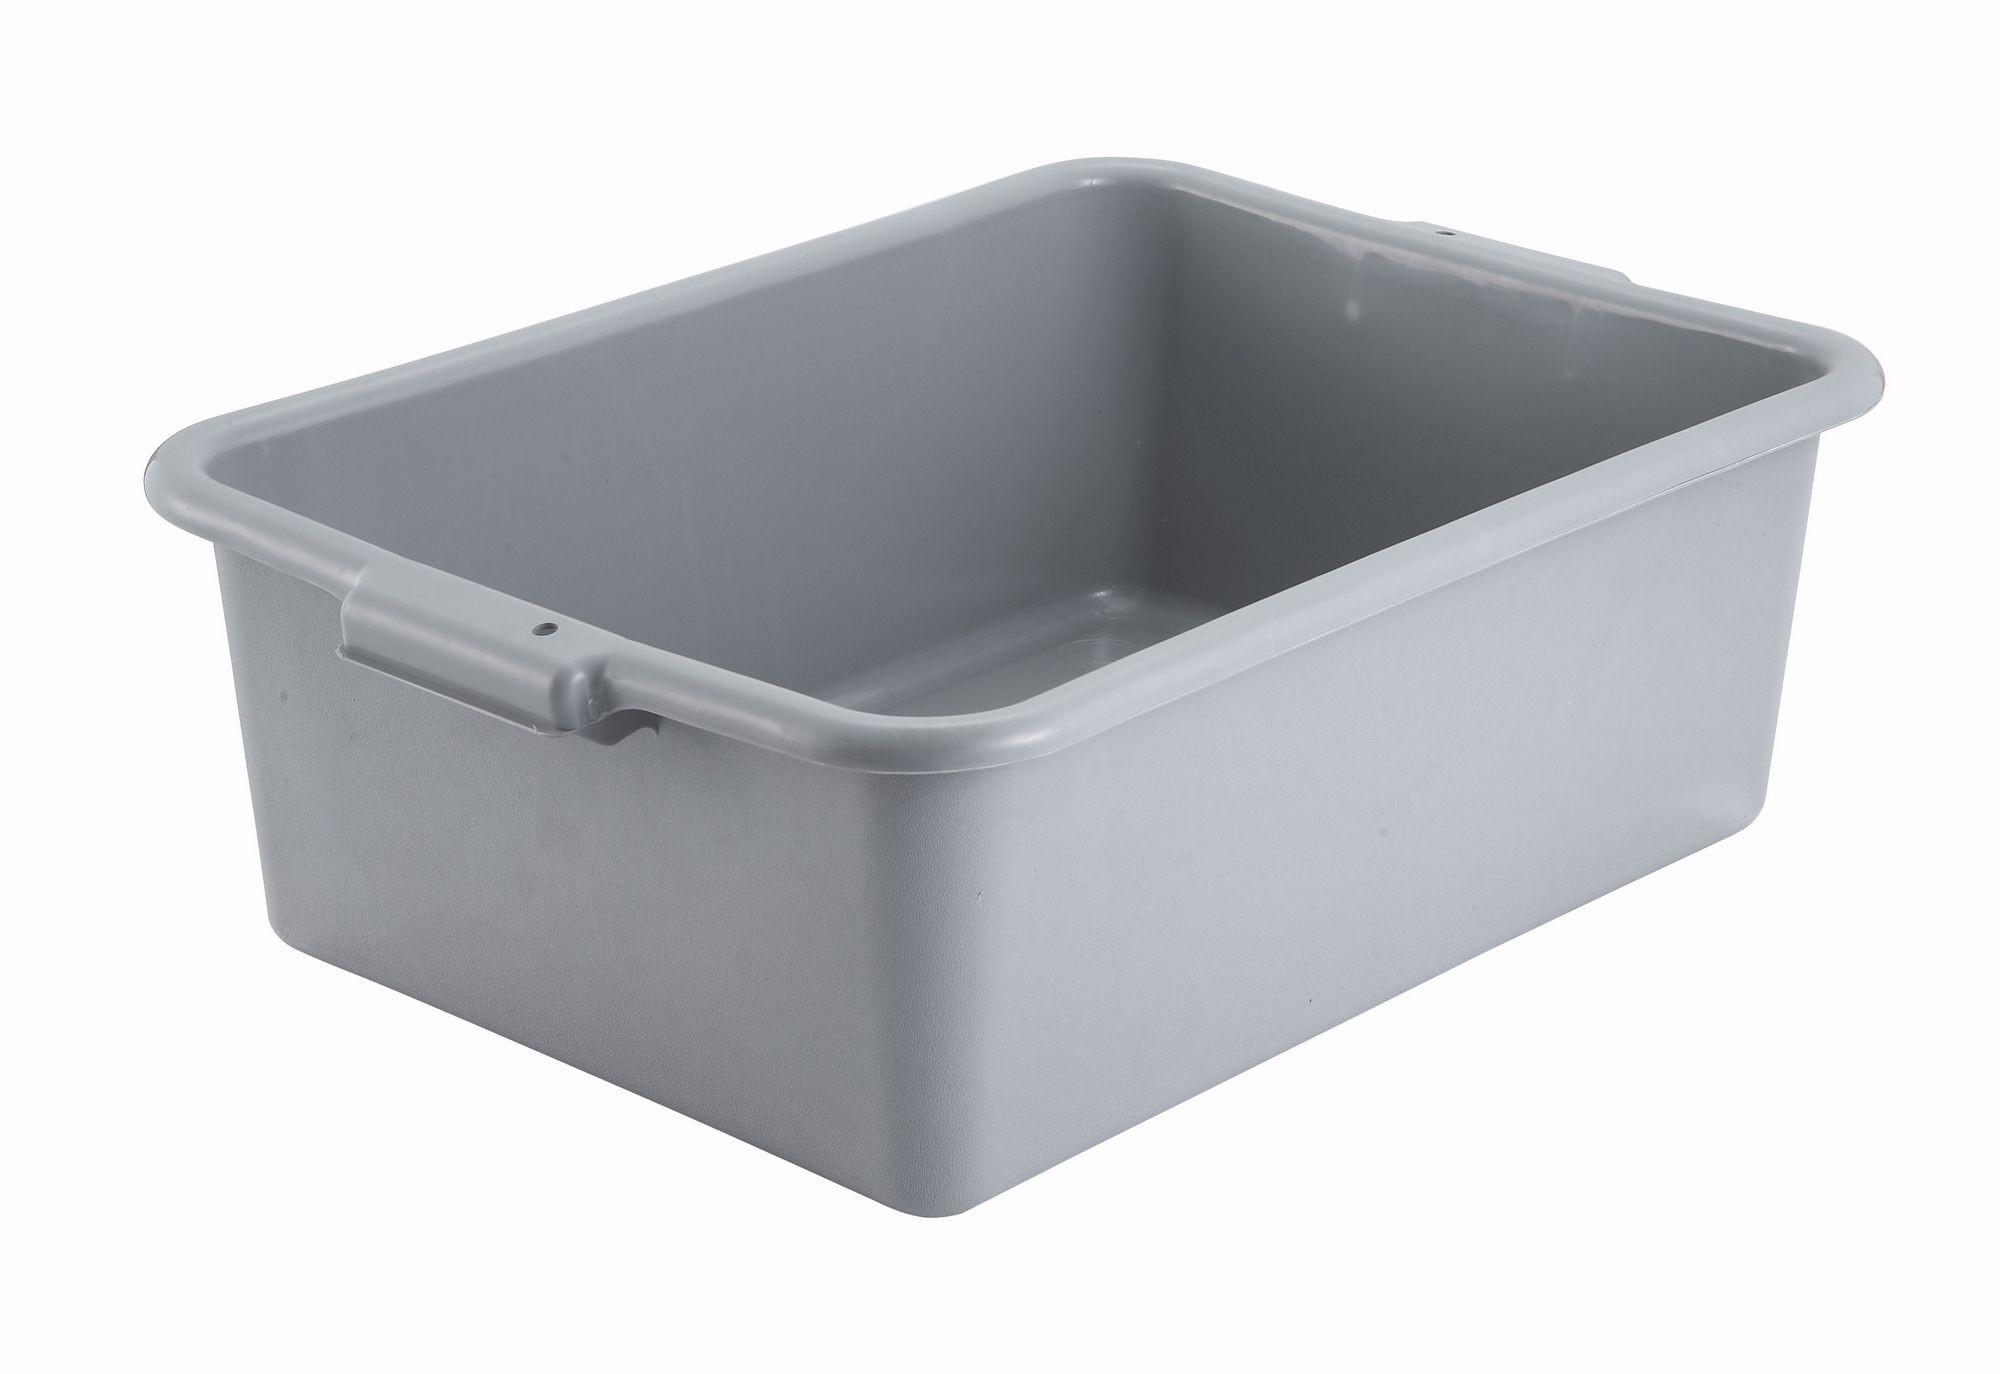 "Winco PL-7G Grey Dish Box 20-1/4"" x 15-1/2"" x 7"""